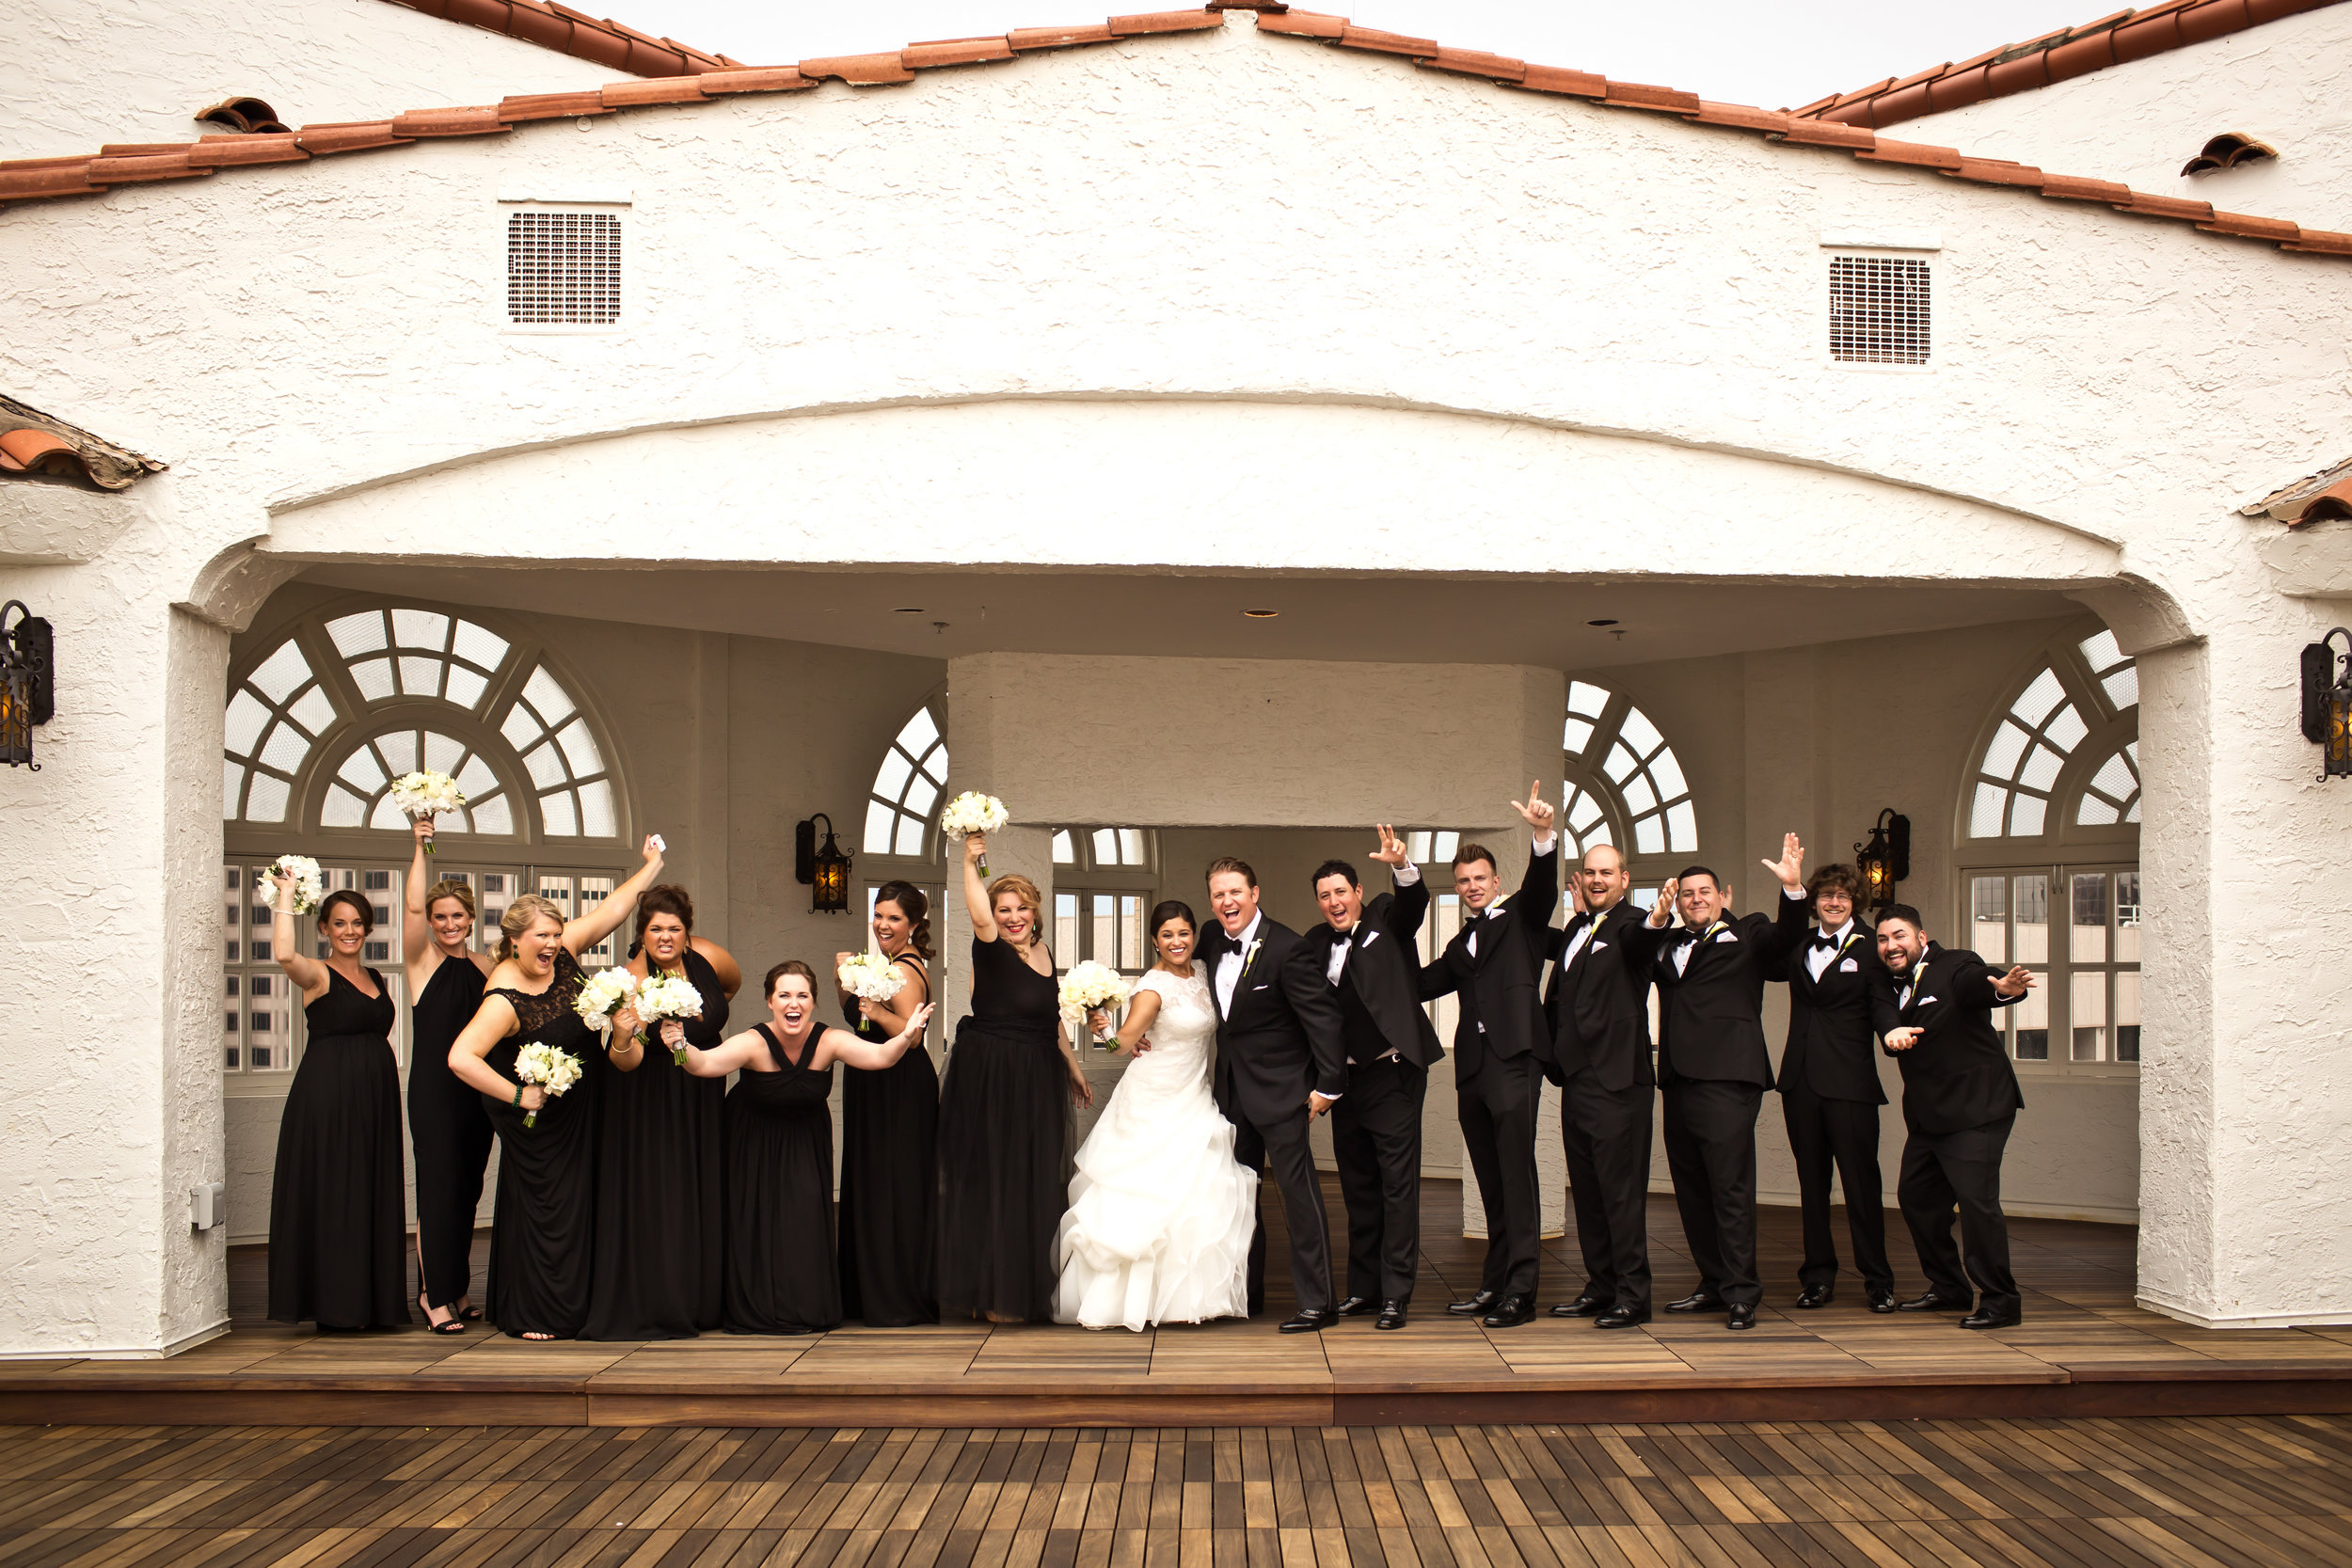 Marble_Falls_Horseshoe_Bay_Photographer_Torres_Wedding_26.jpg